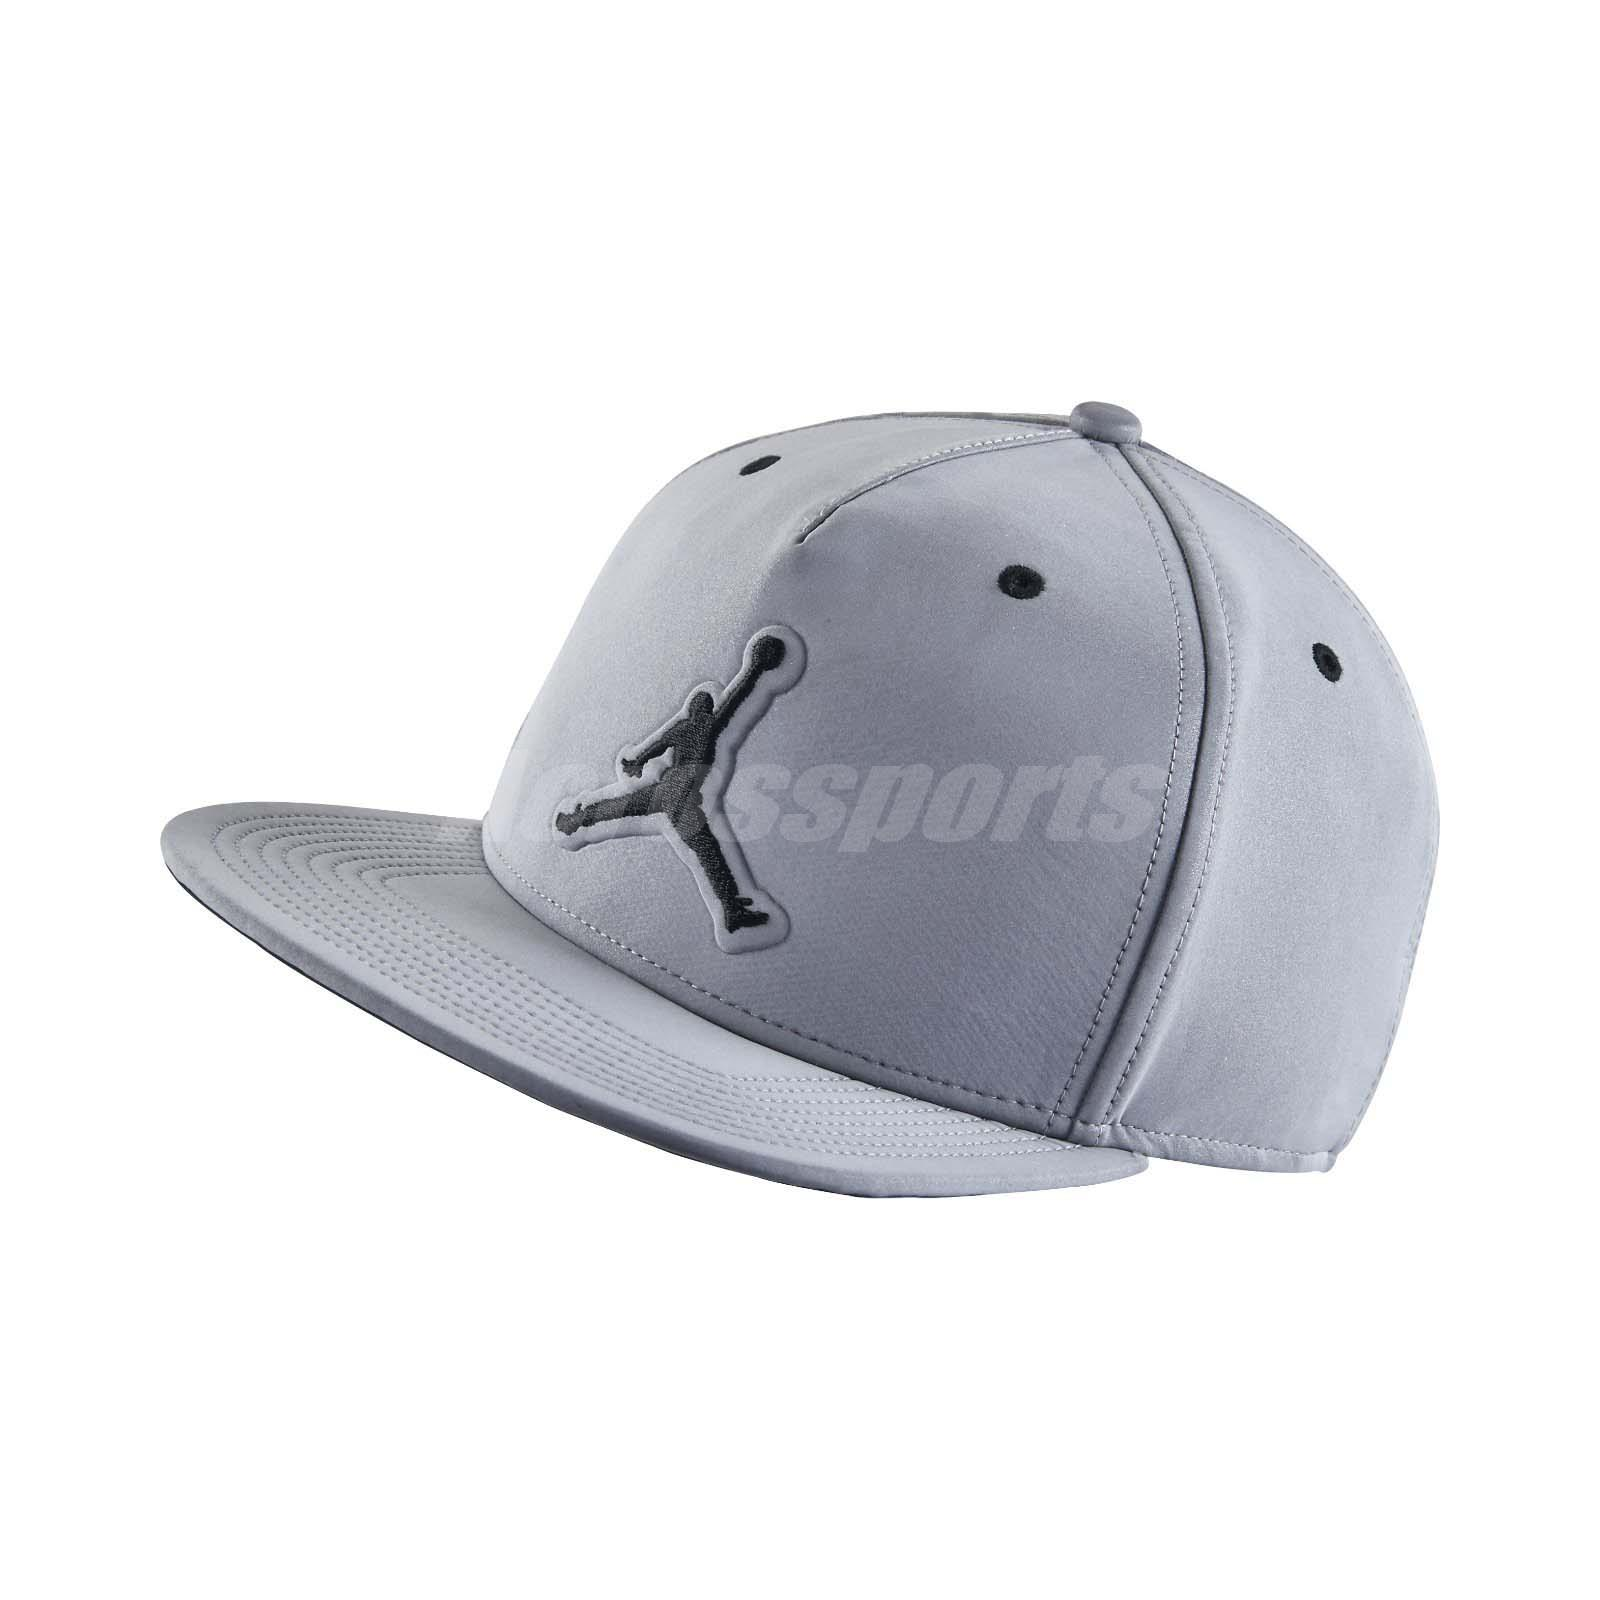 e5055bbf61e347 Details about Nike Air Jordan 5 Retro V Grey 3M Reflective Cap Snapback  Adjustable 801773-096